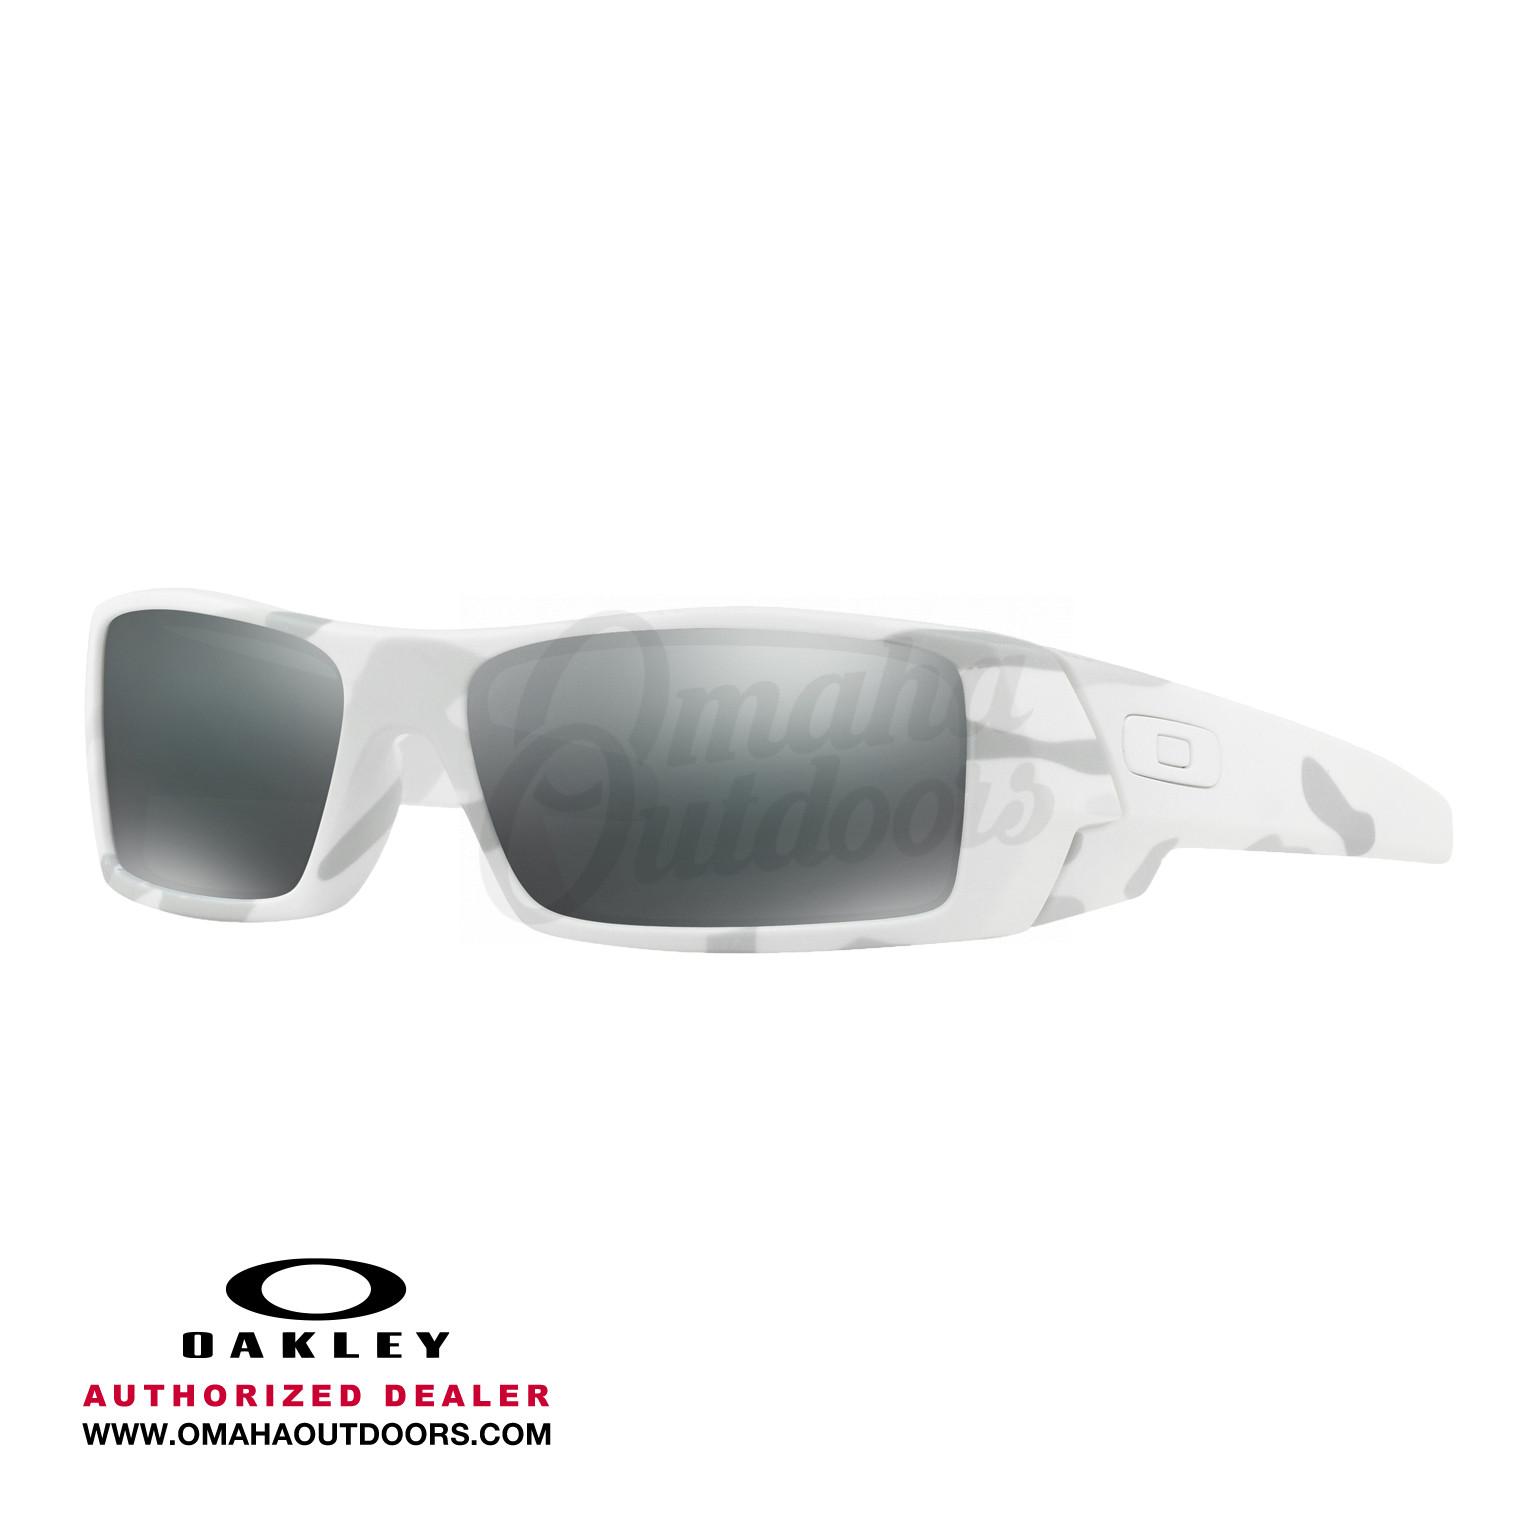 b5b5ae22731 ... promo code for oakley si gascan alpine multicam sunglasses black  iridium lens oo9014 14 dde92 c912a